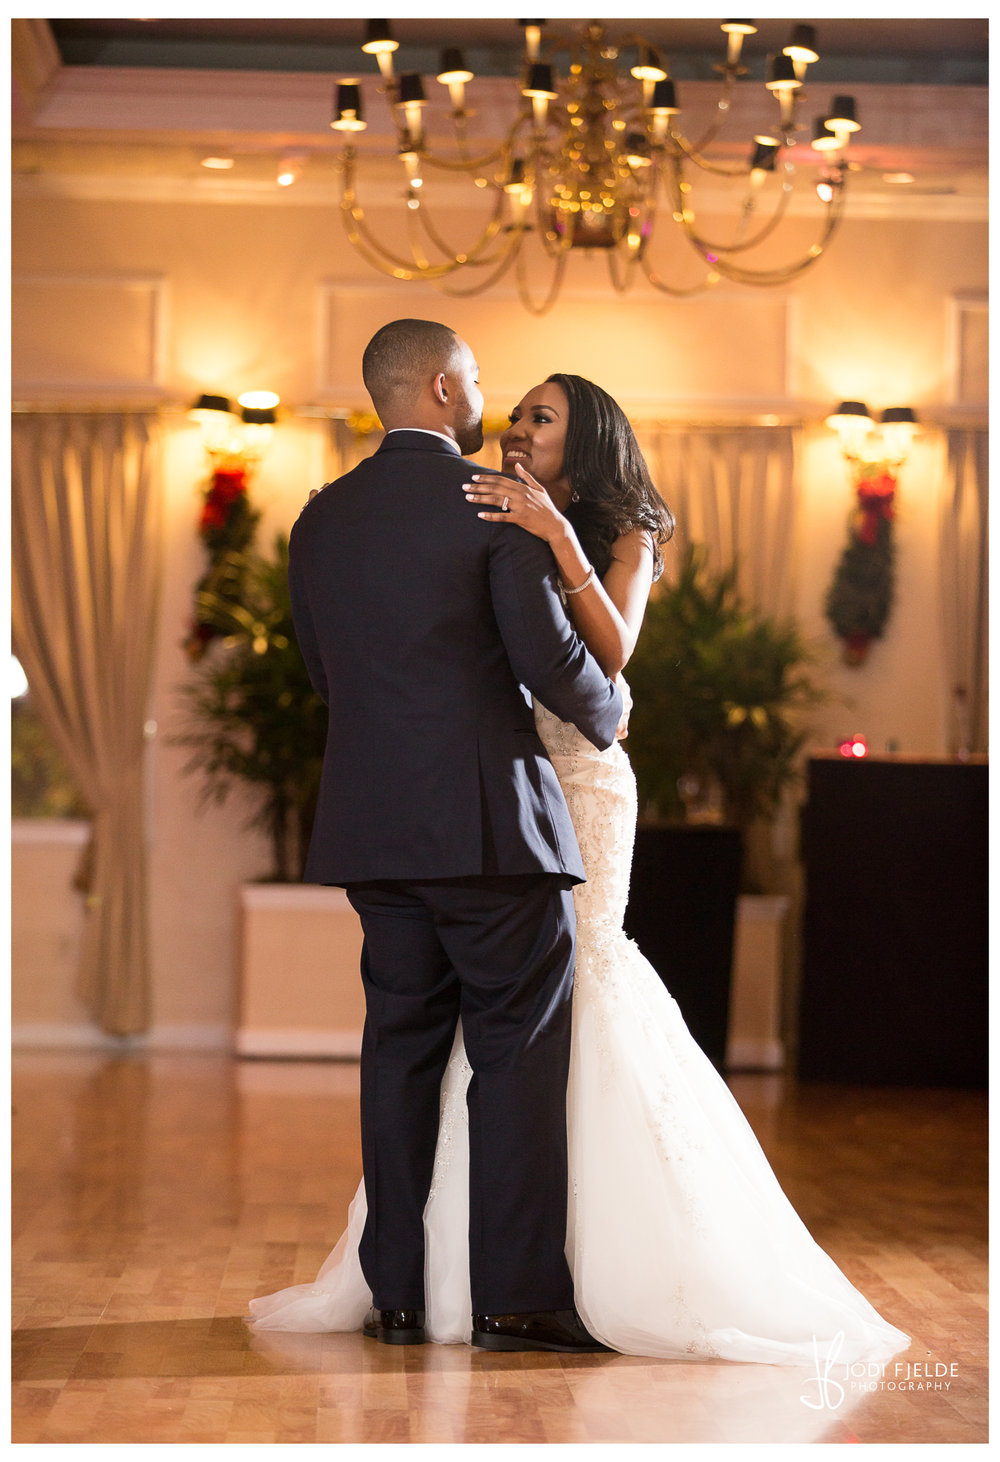 Benvenuto_wedding_Boynton_Beach_Jodi_Fjelde_Photography_Nikki_Otis_married_24.jpg